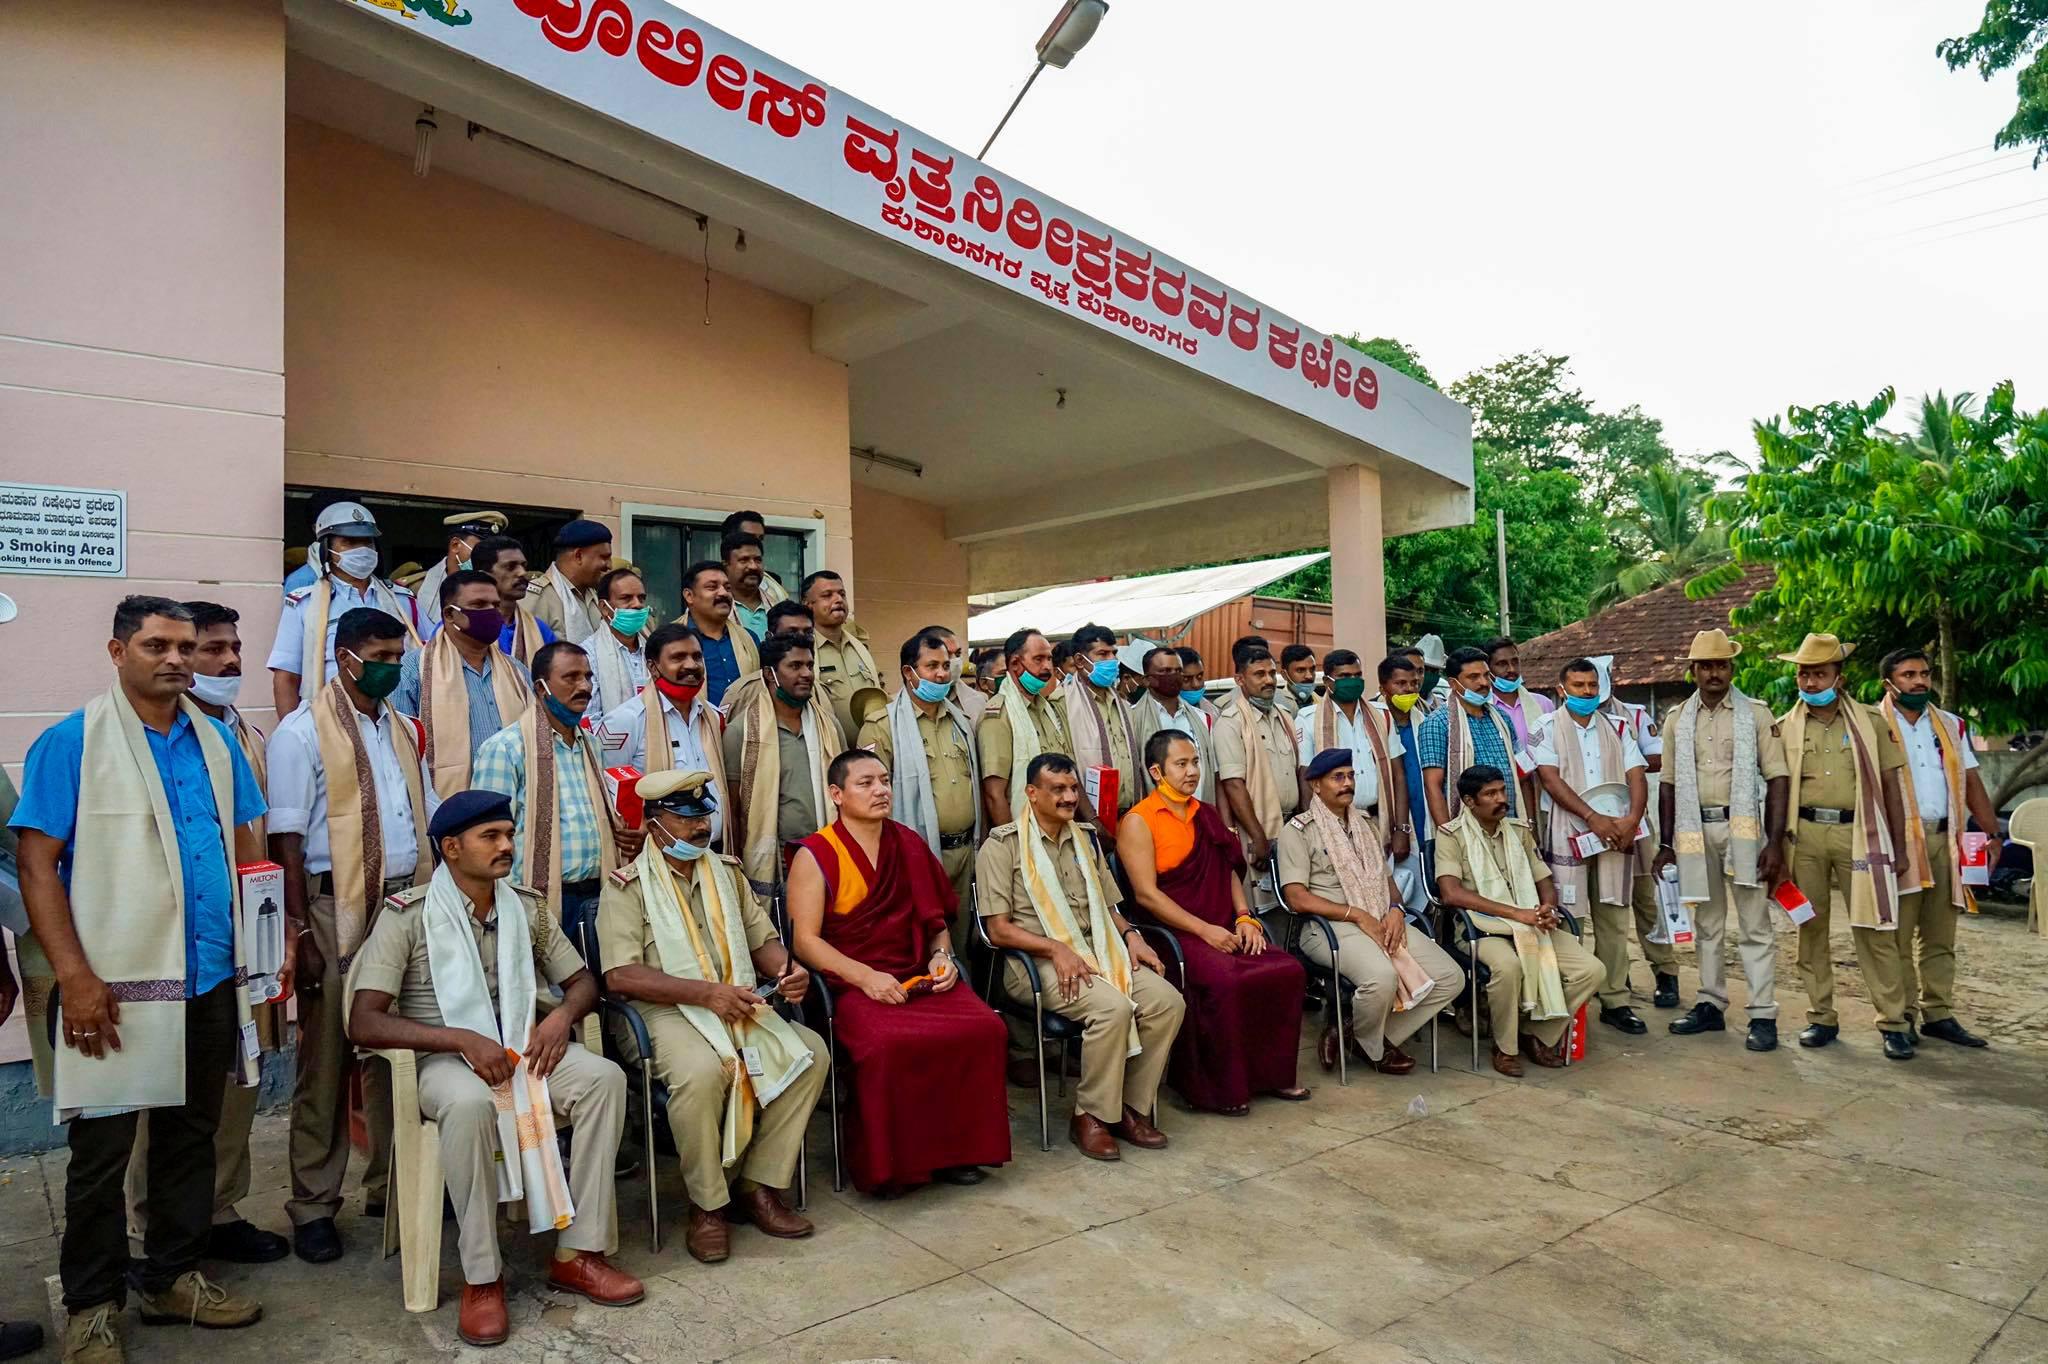 Fotografie de grup cu Tulku Tsering Choedhar cu poliția din Kushalnagar și gardienii